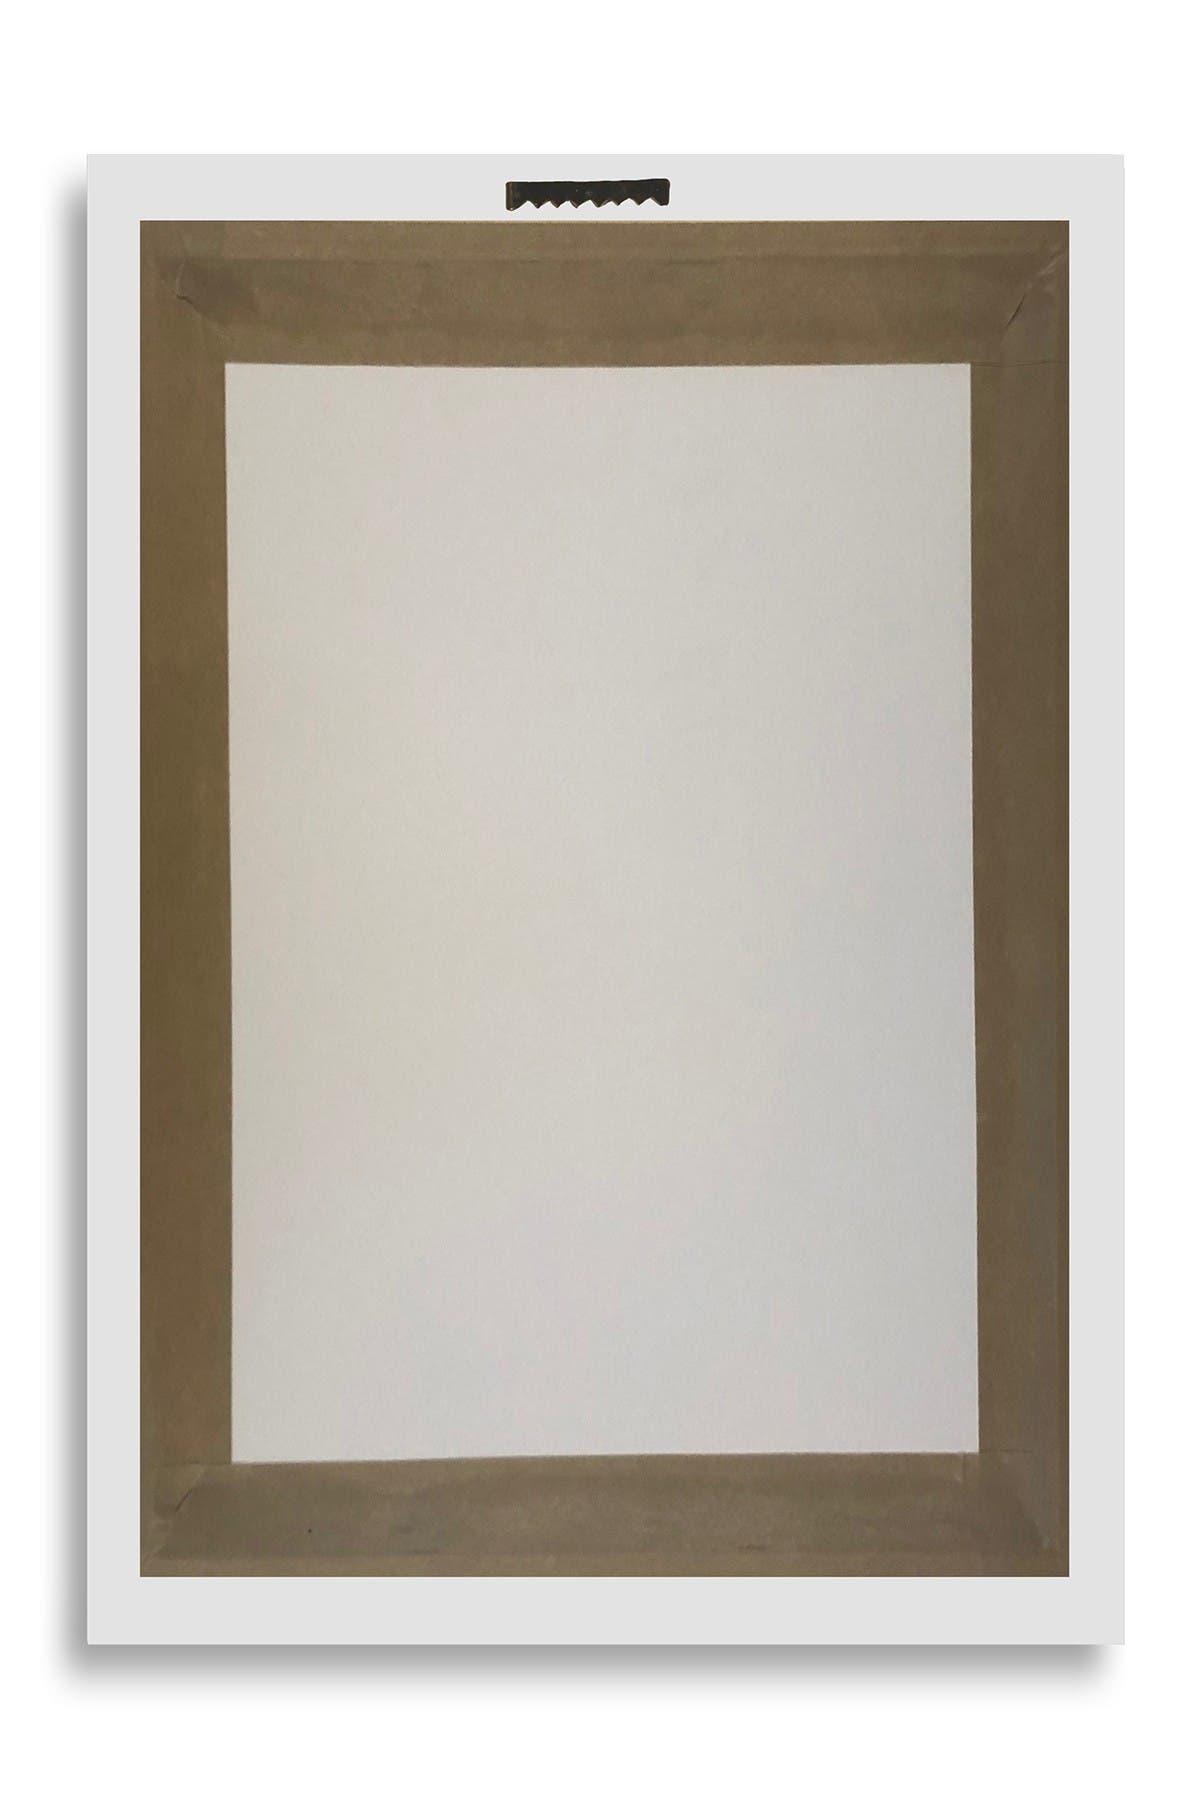 Image of Wynwood Studio Golden Solildarity Abstract Framed Wall Art